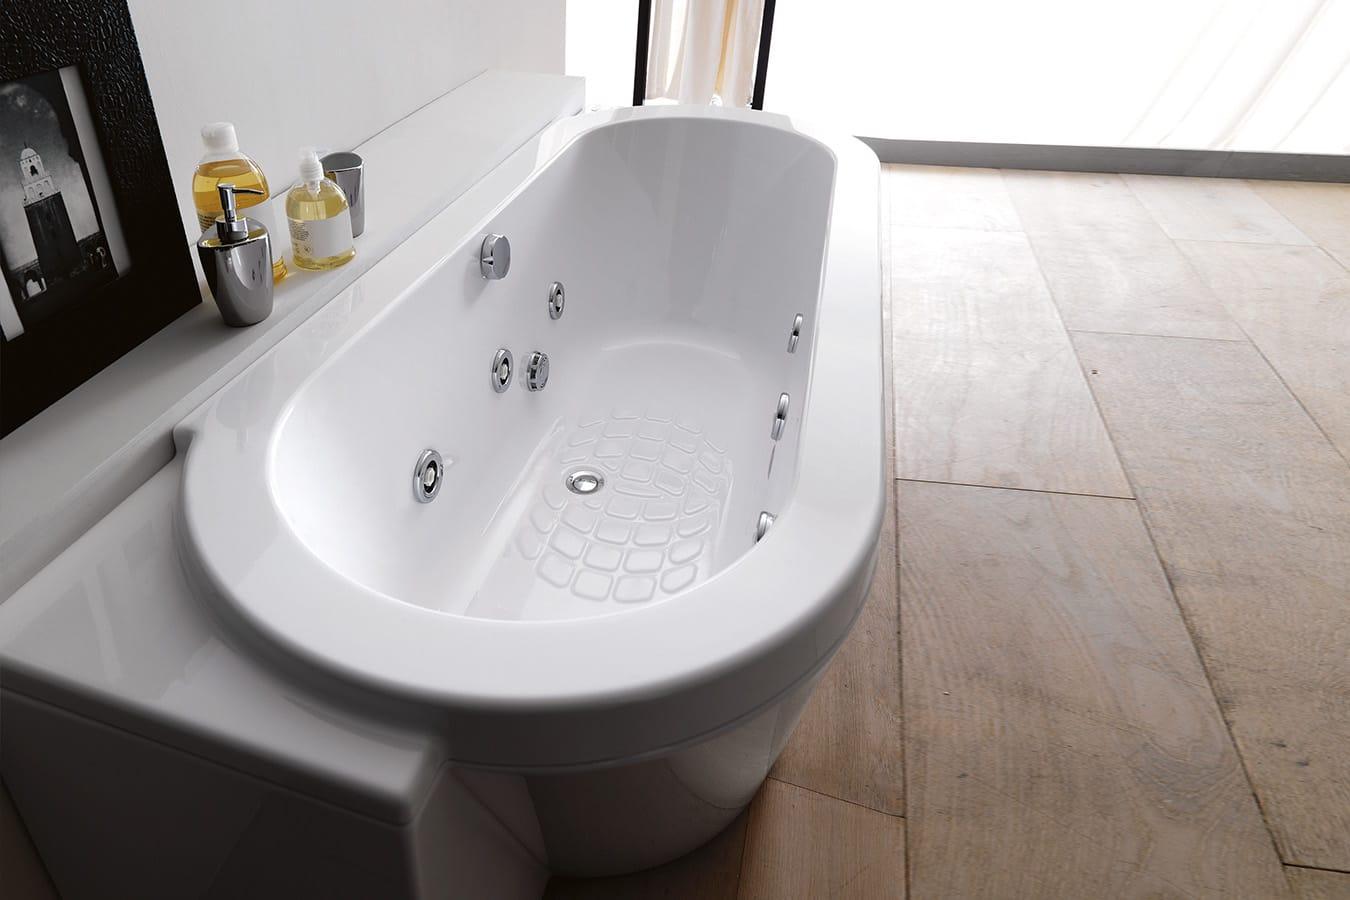 Vasche Da Bagno Idromassaggio : Hs b bagno idromassaggio vasca da bagno portatile personale per